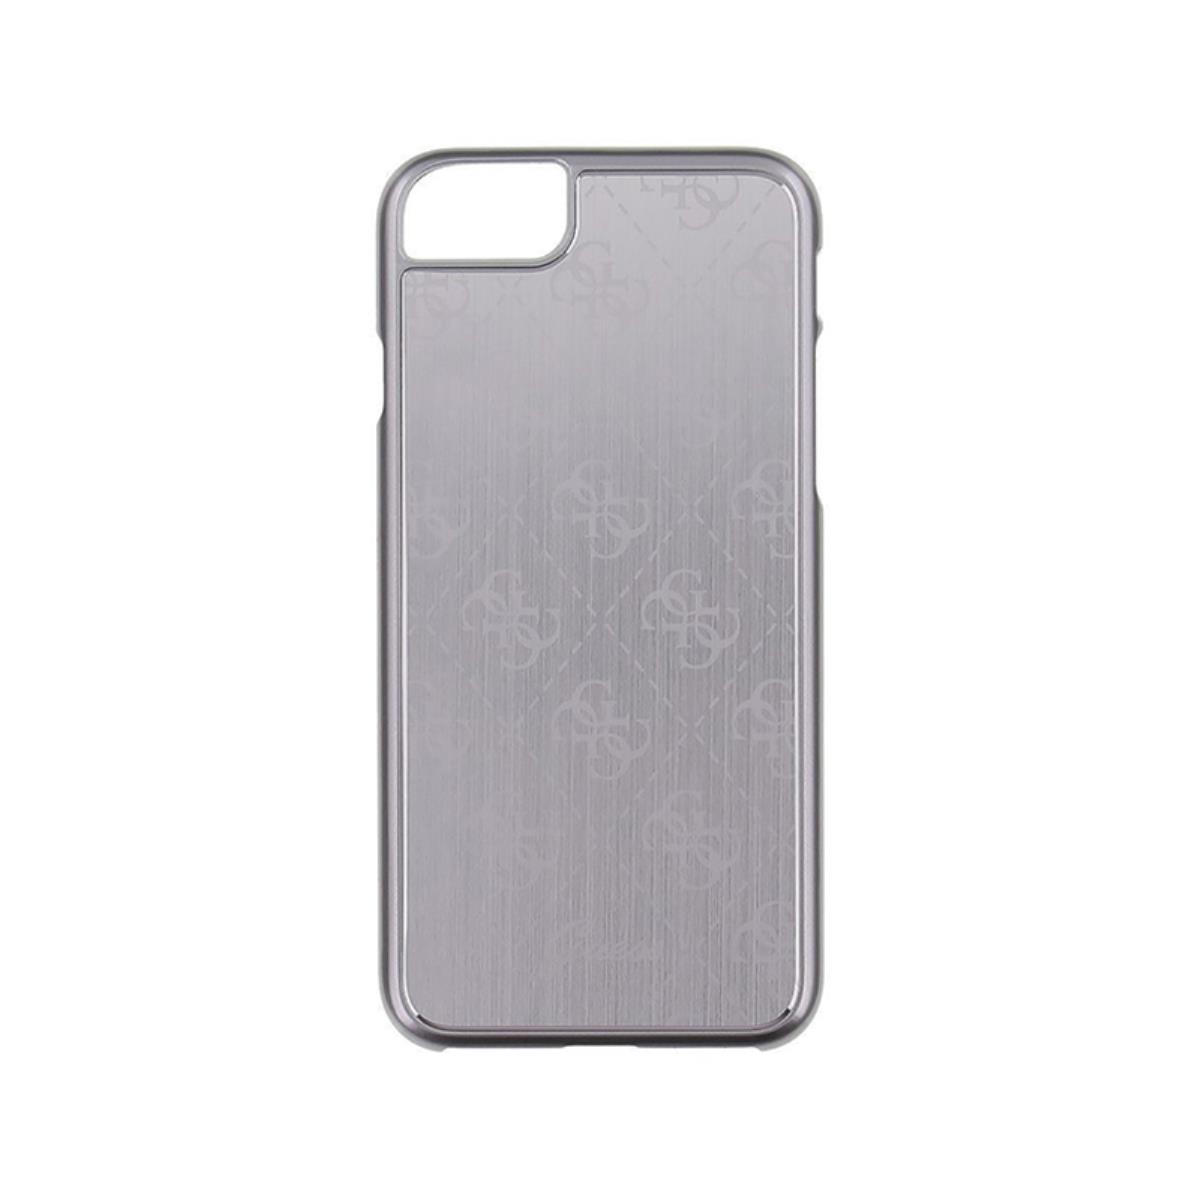 42a004961 Compre online Funda Metalica Hardcase Guess iPhone 7 Plateado (GUHCP7MESI)